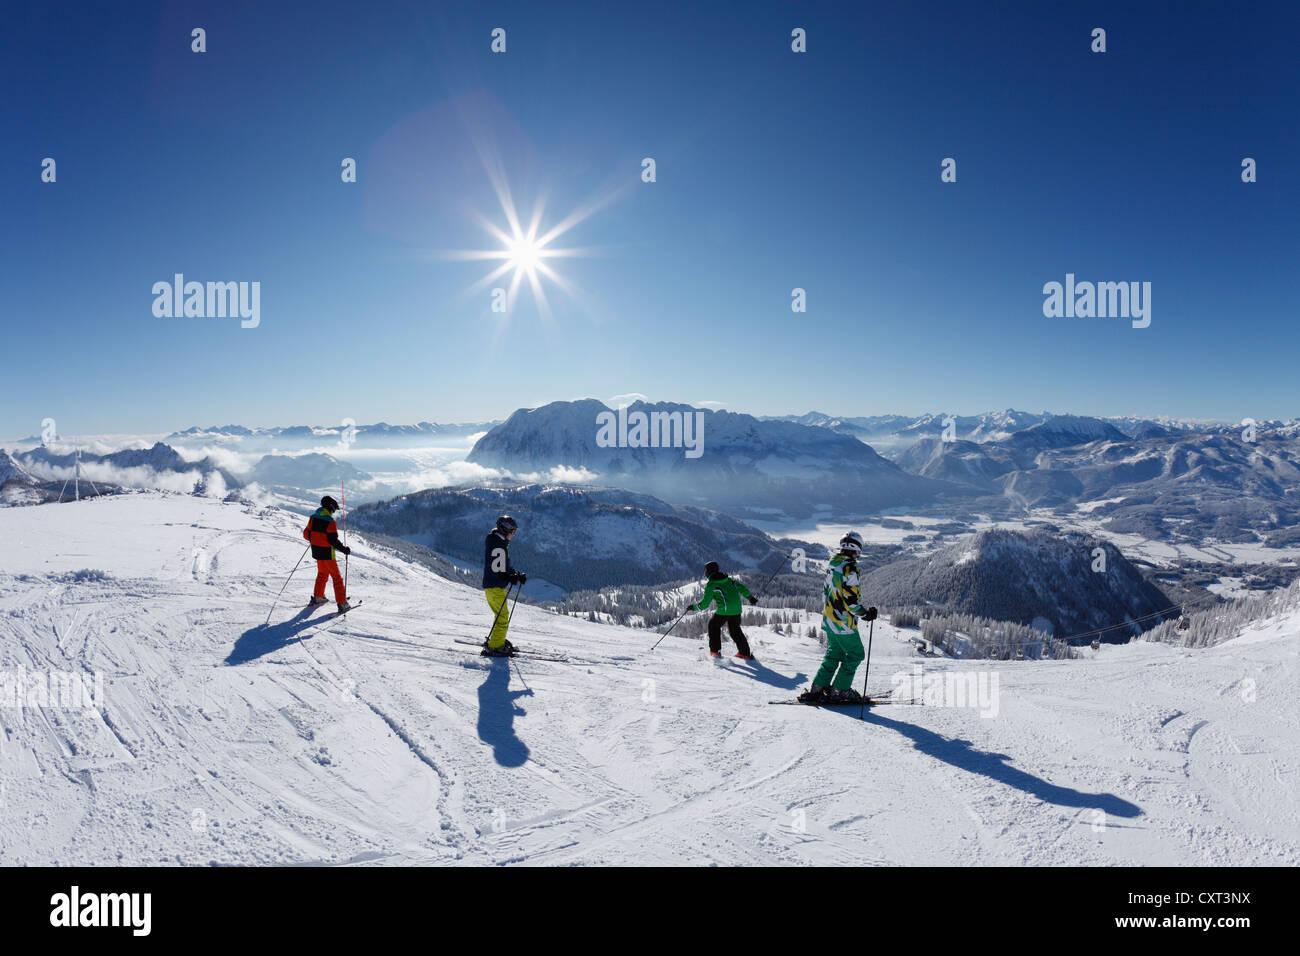 Tauplitz skiing area, Tauplitzalm alp, Grimming in the middle, Bad Mitterndorf, Ausseerland, Salzkammergut, Styria, - Stock Image